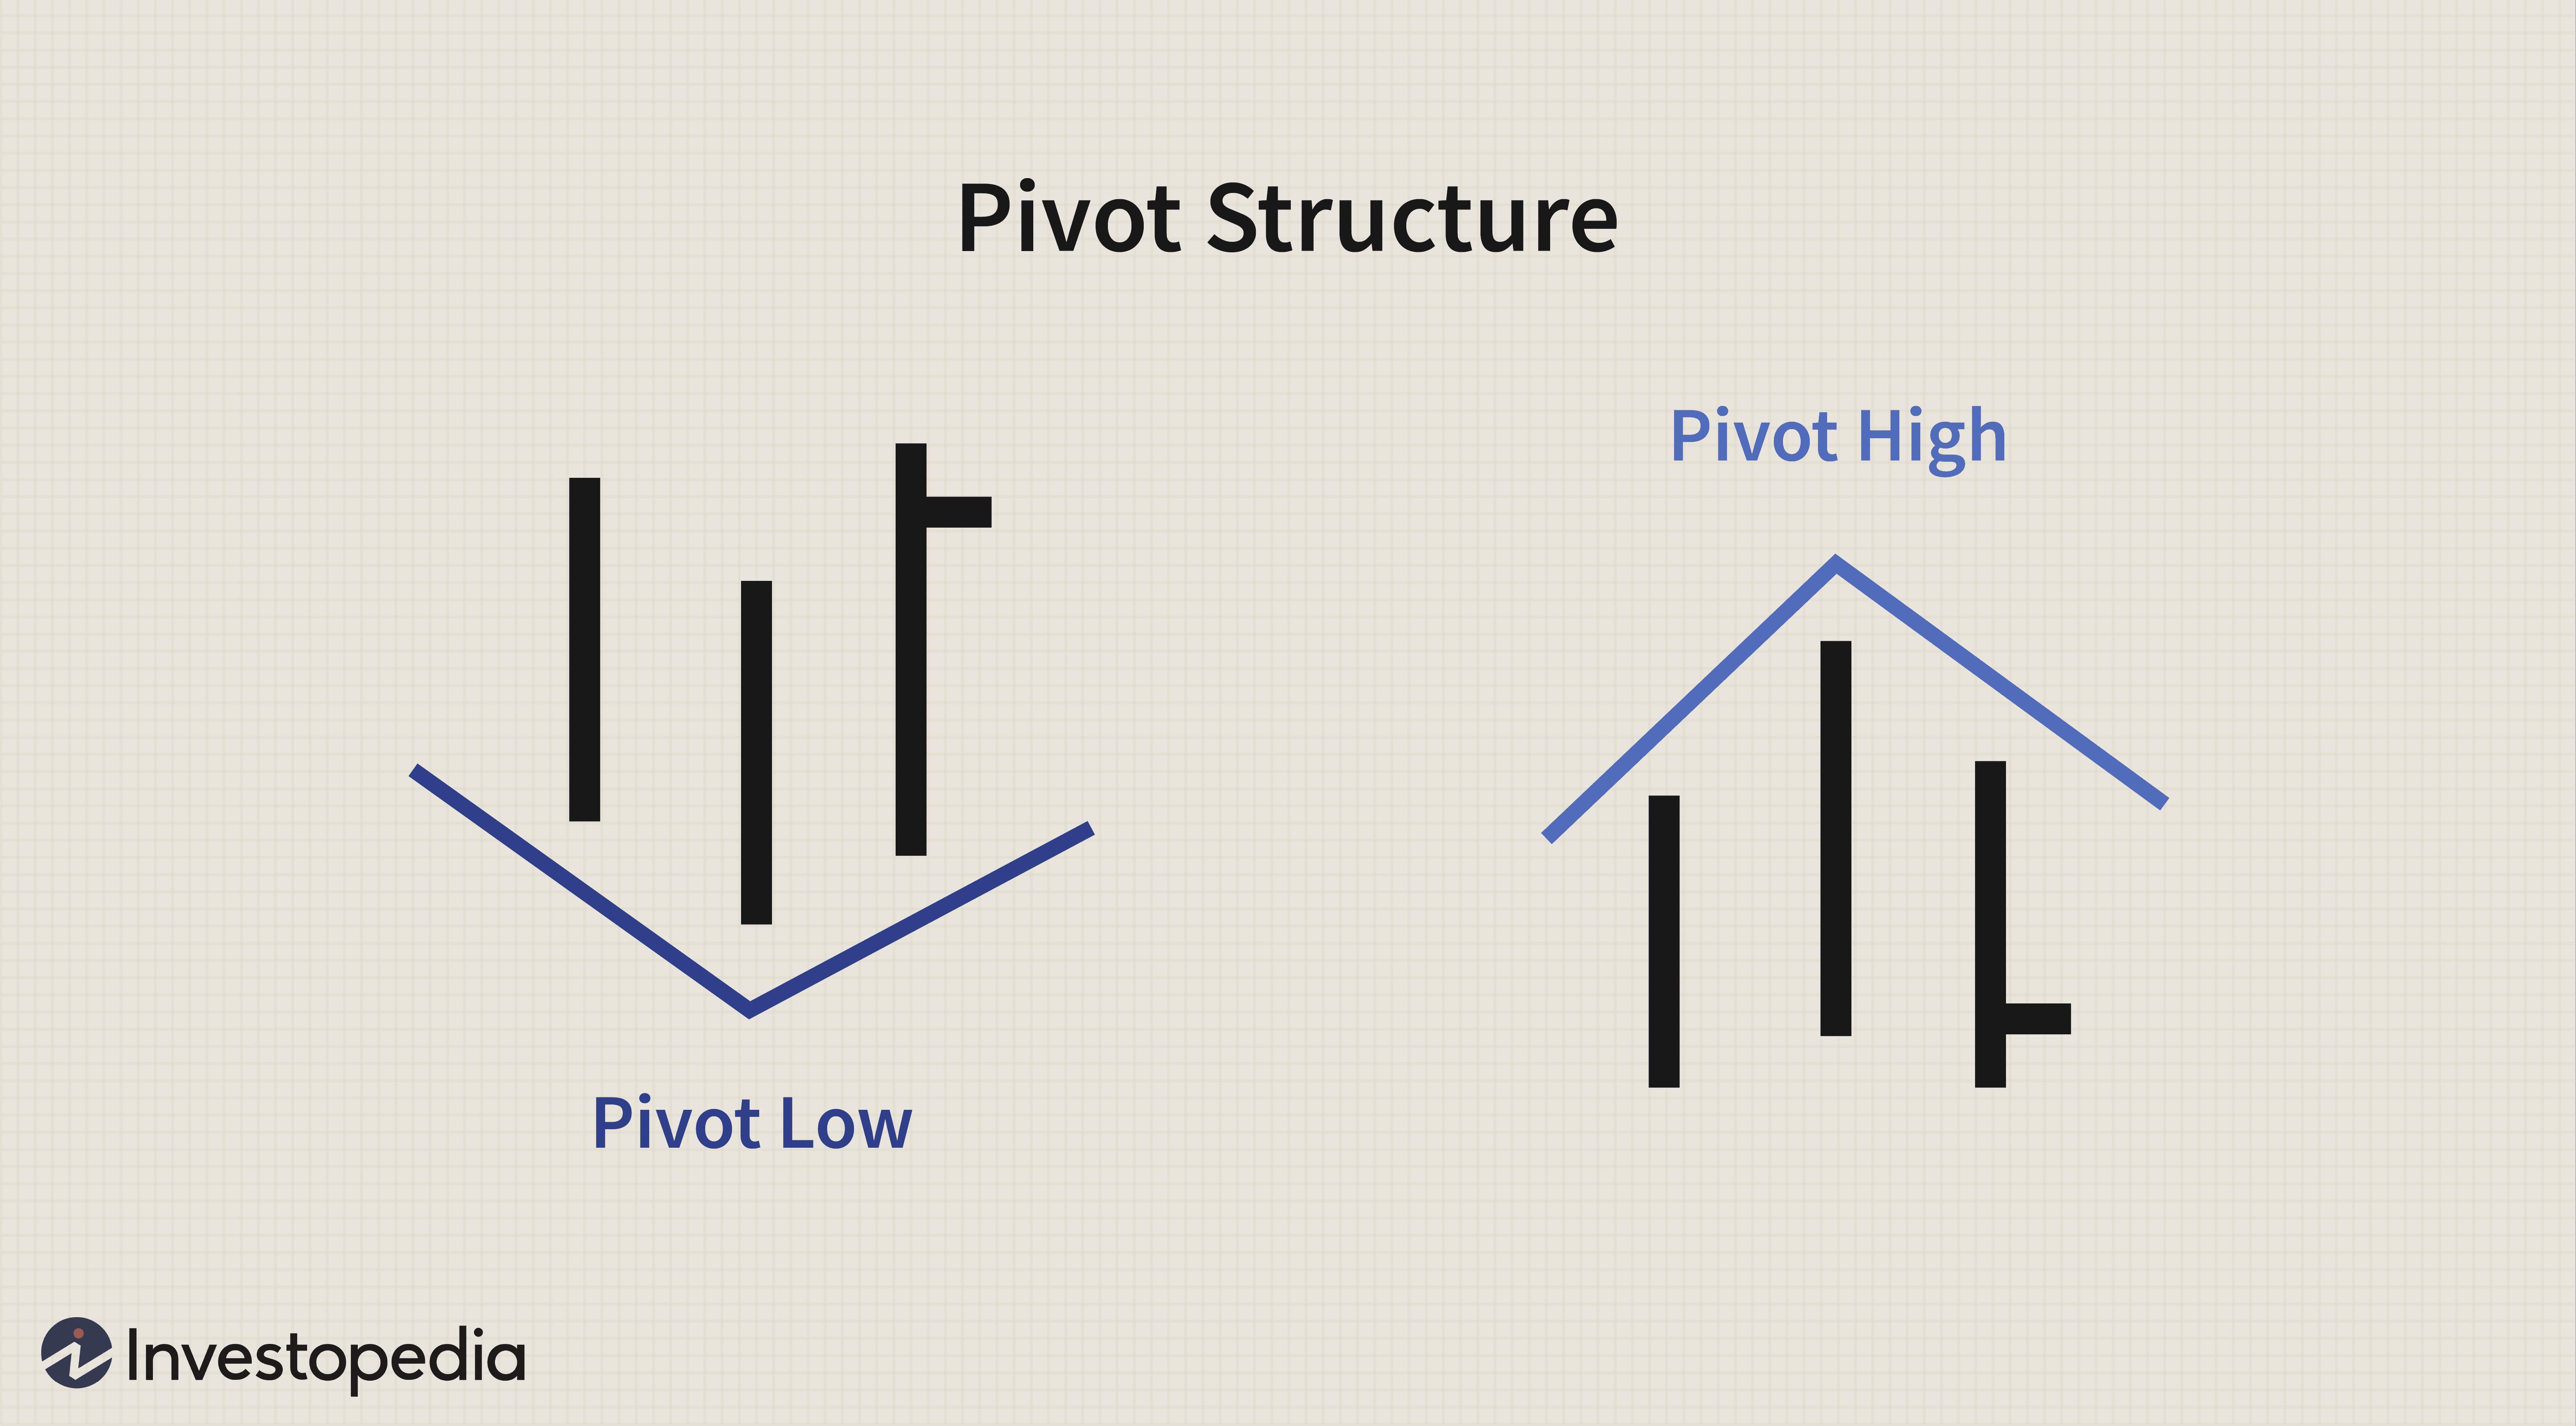 Pivot Structure